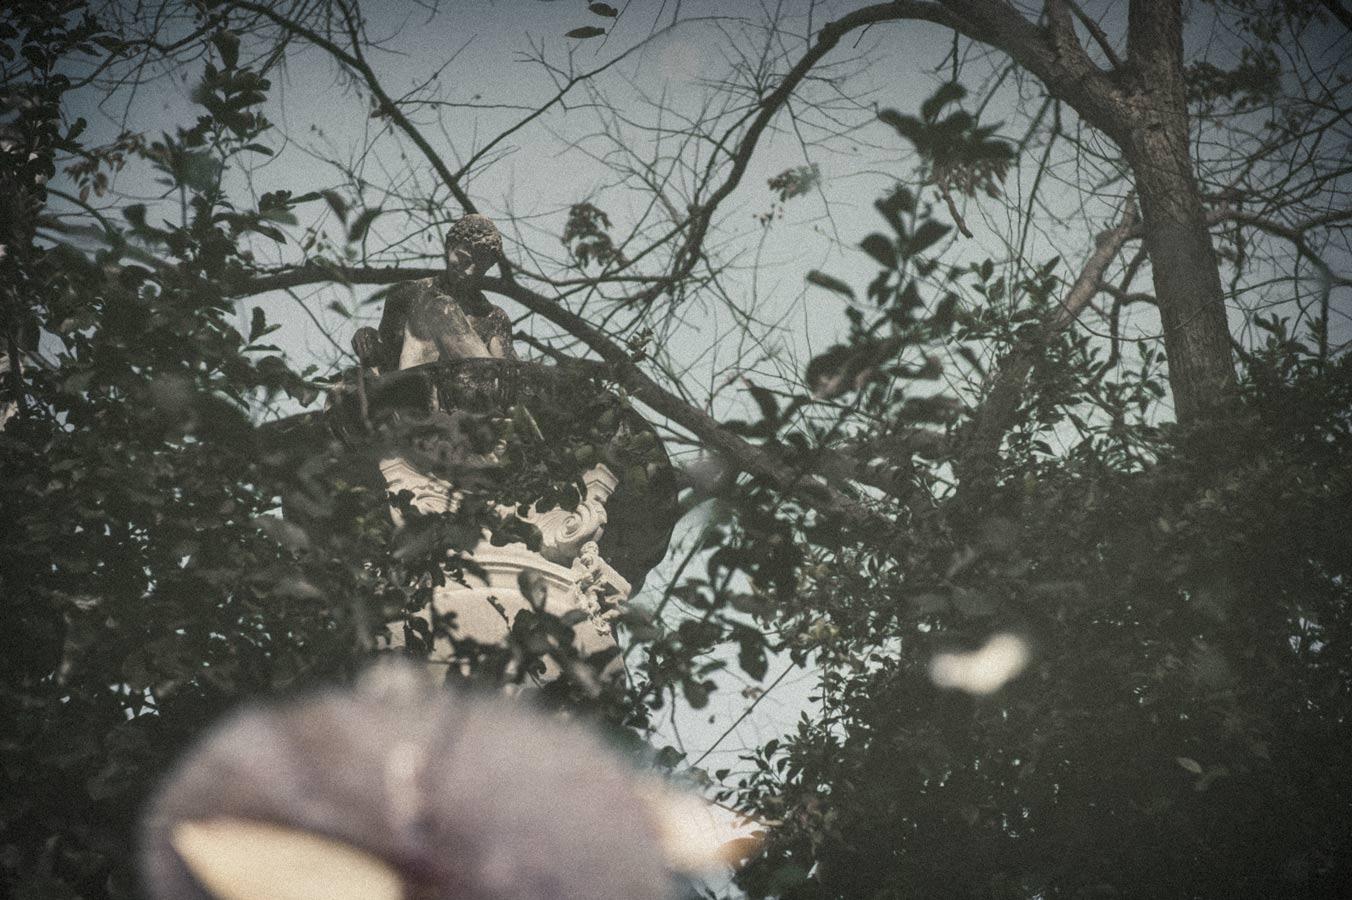 Jamie-Lowe-Photography-Haunted-House-Chiang-Mai-85.jpg